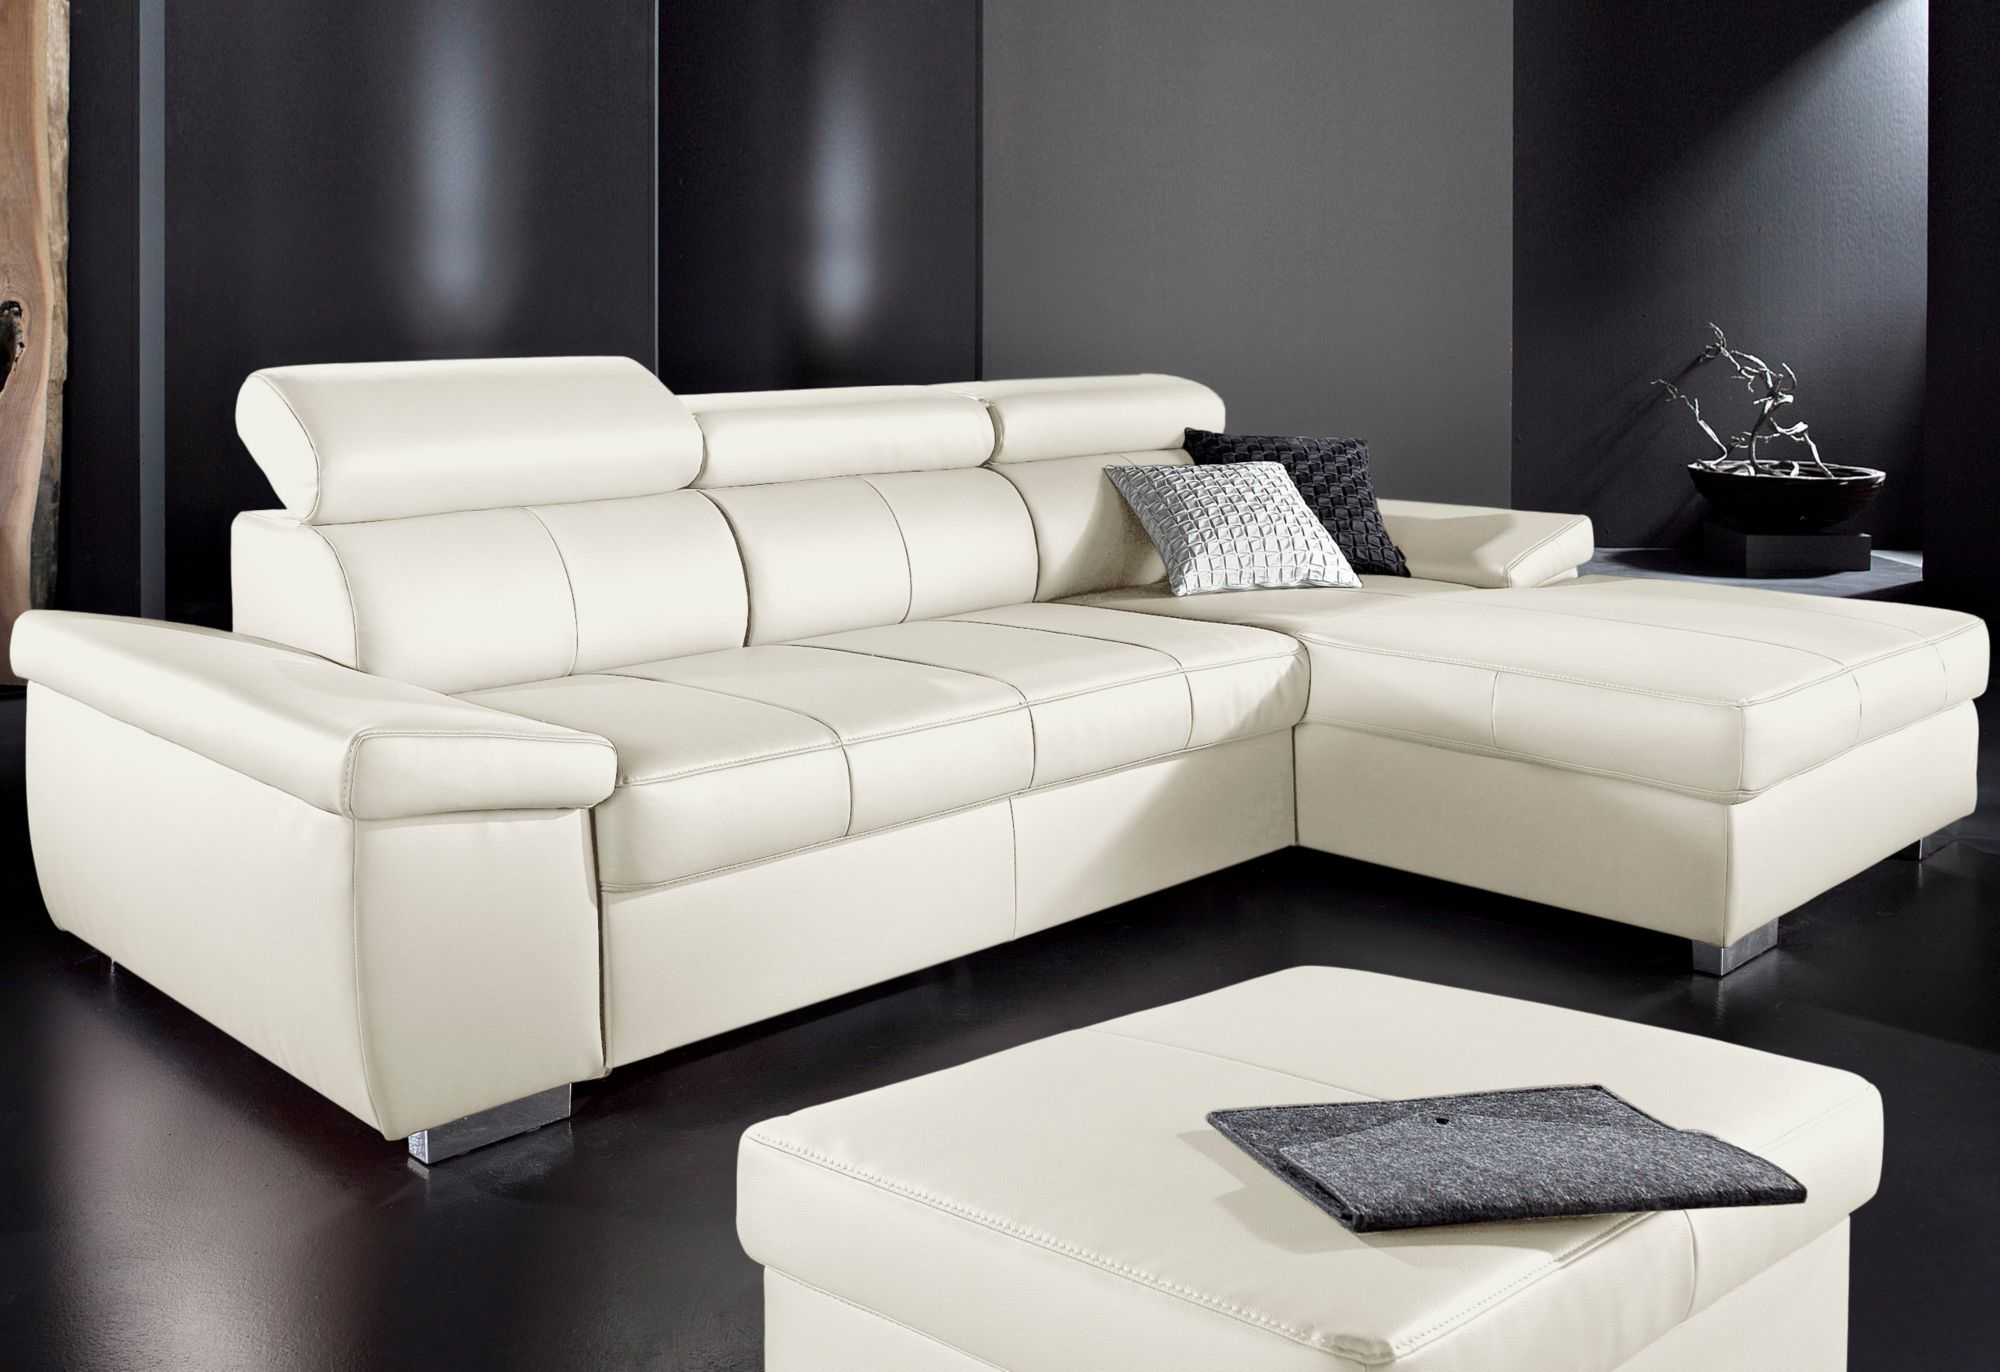 polsterecke mit recamiere sit more wahlweise mit bettfunktion schwab versand leder ecksofas. Black Bedroom Furniture Sets. Home Design Ideas